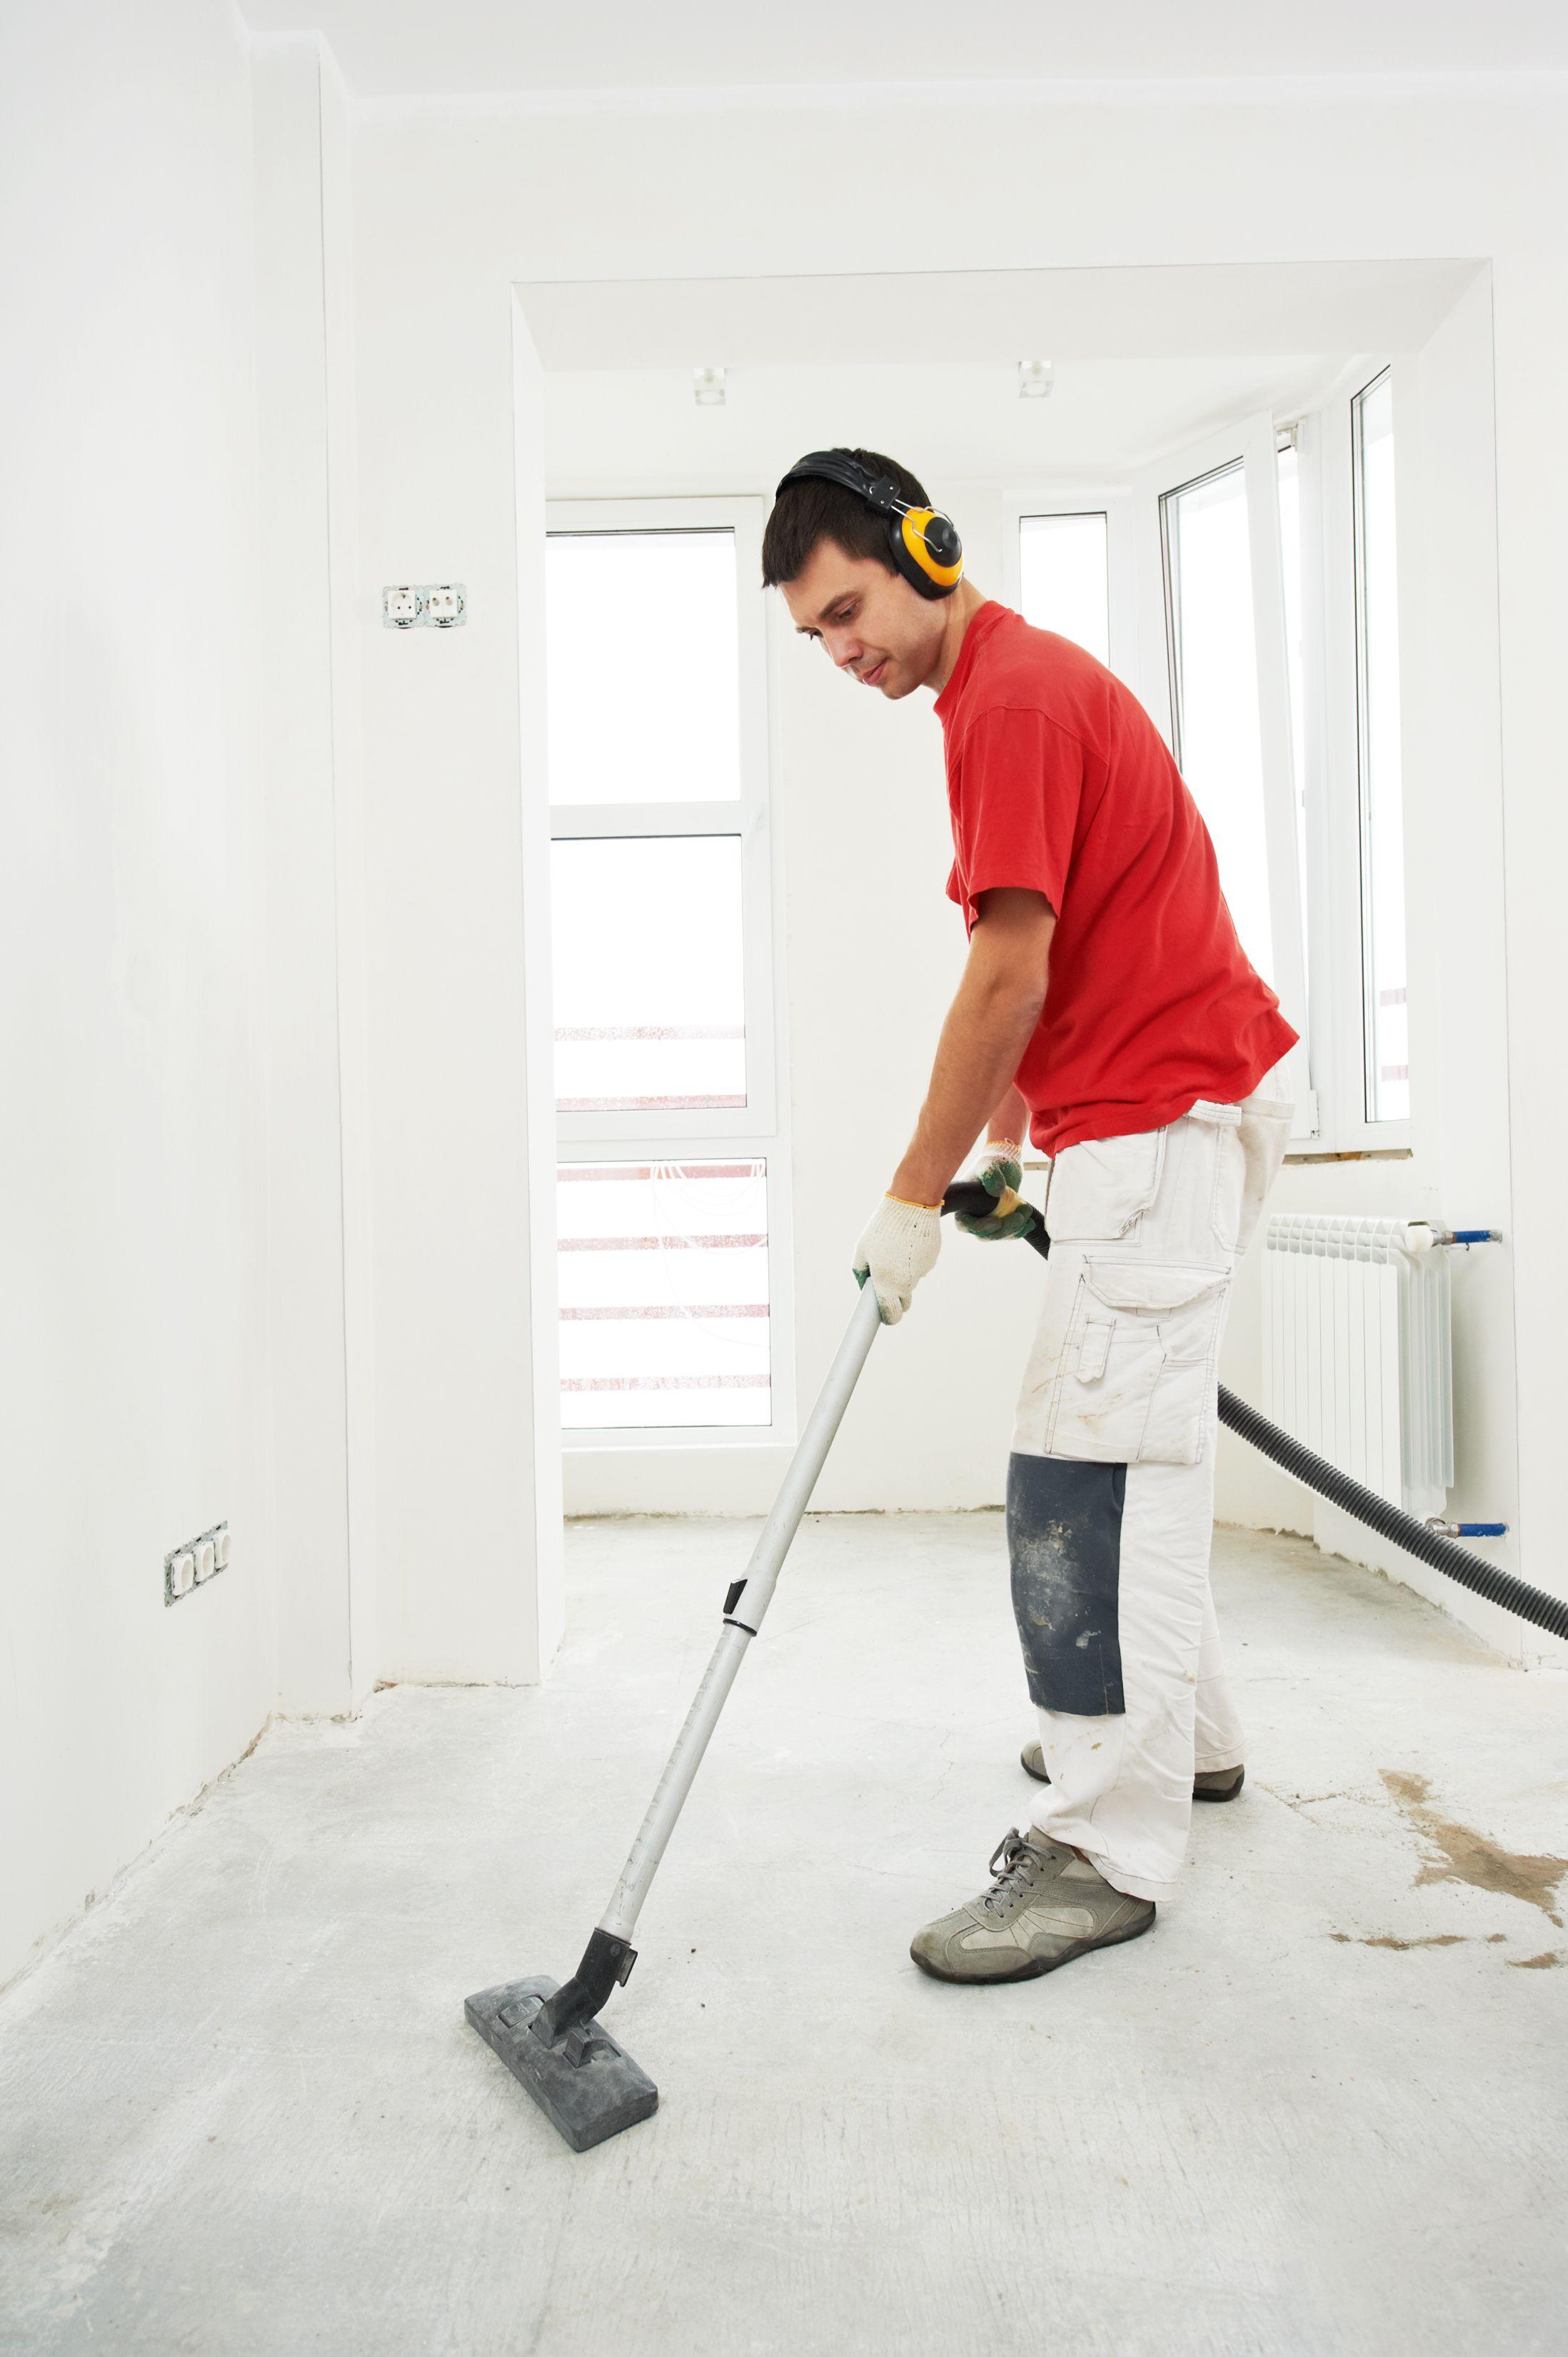 1 514 519 3527 Grand Menage Residentiel Commercial Industriel Quebec Canadian Province Conciergerie D Entreprise A Floor Cleaner Home Renovation Flooring